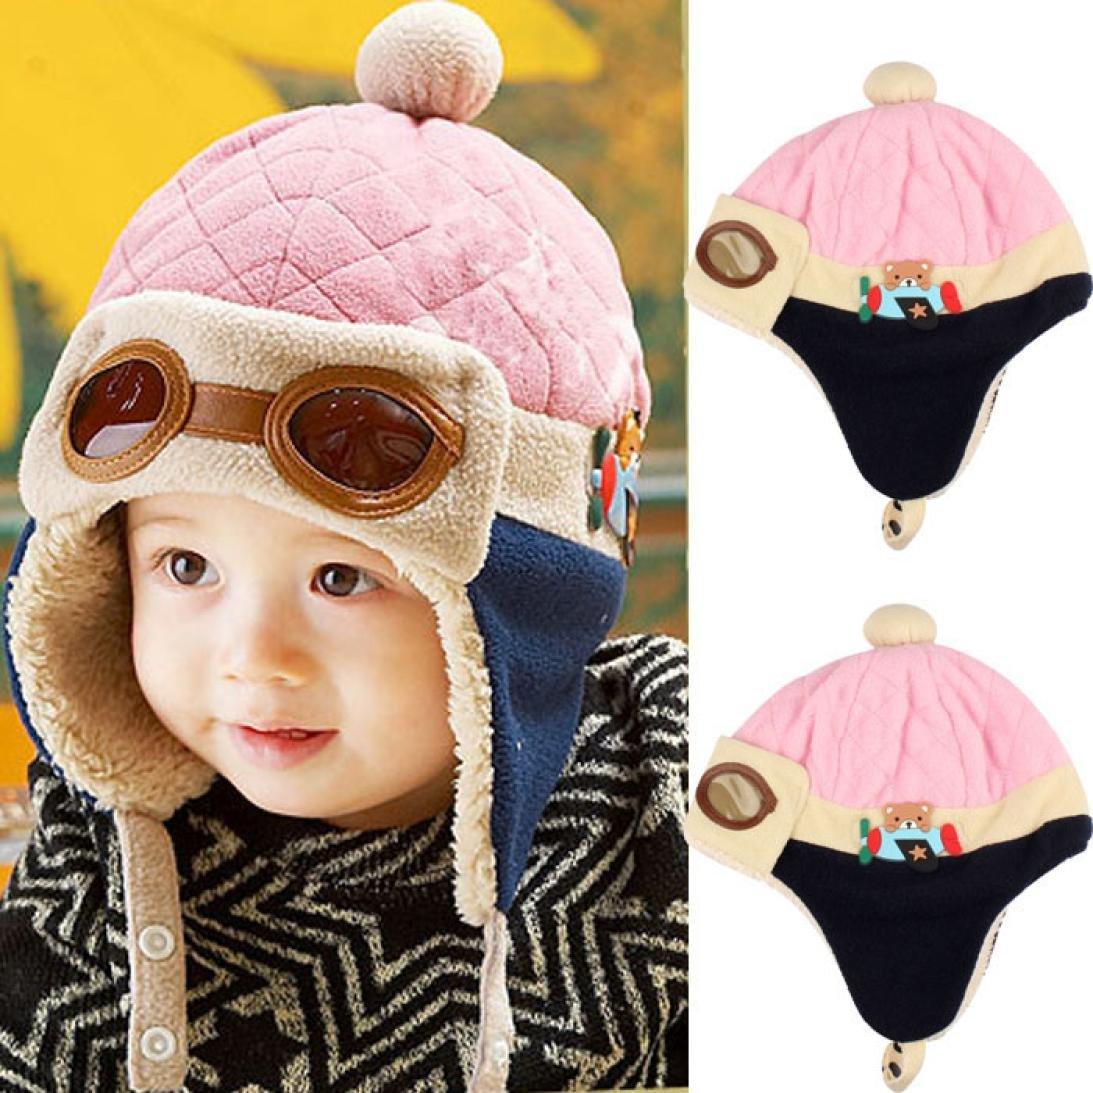 0cd2ac519 Makaor Baby Girls Boys Hats Winter Warm Cap Hat Beanie Pilot Aviator  Crochet Earflap